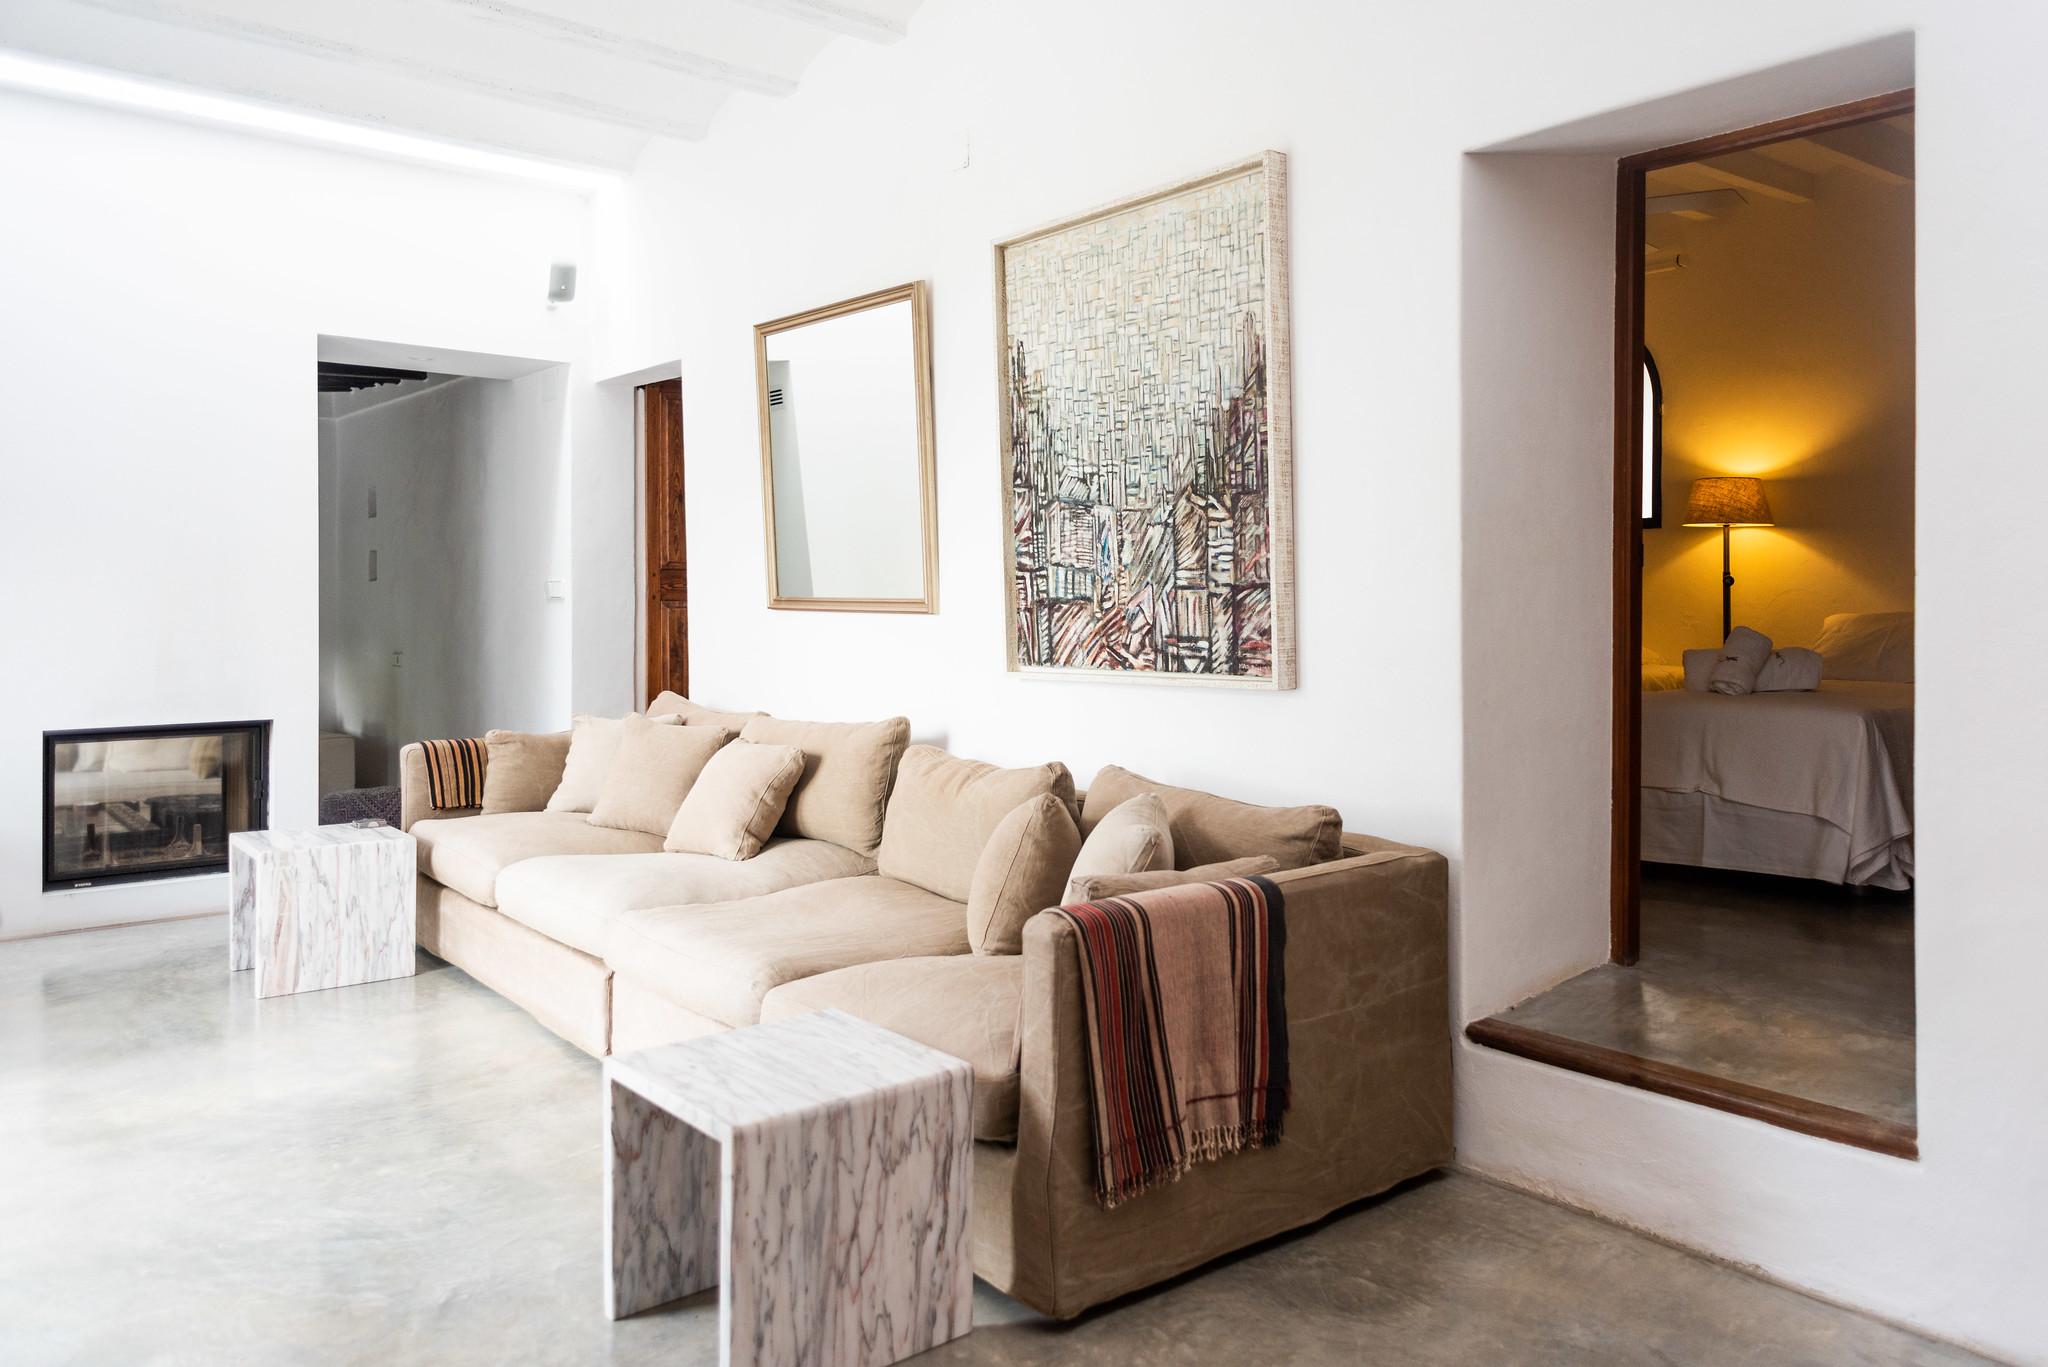 https://www.white-ibiza.com/wp-content/uploads/2020/05/white-ibiza-villas-can-lyra-living-room.jpg